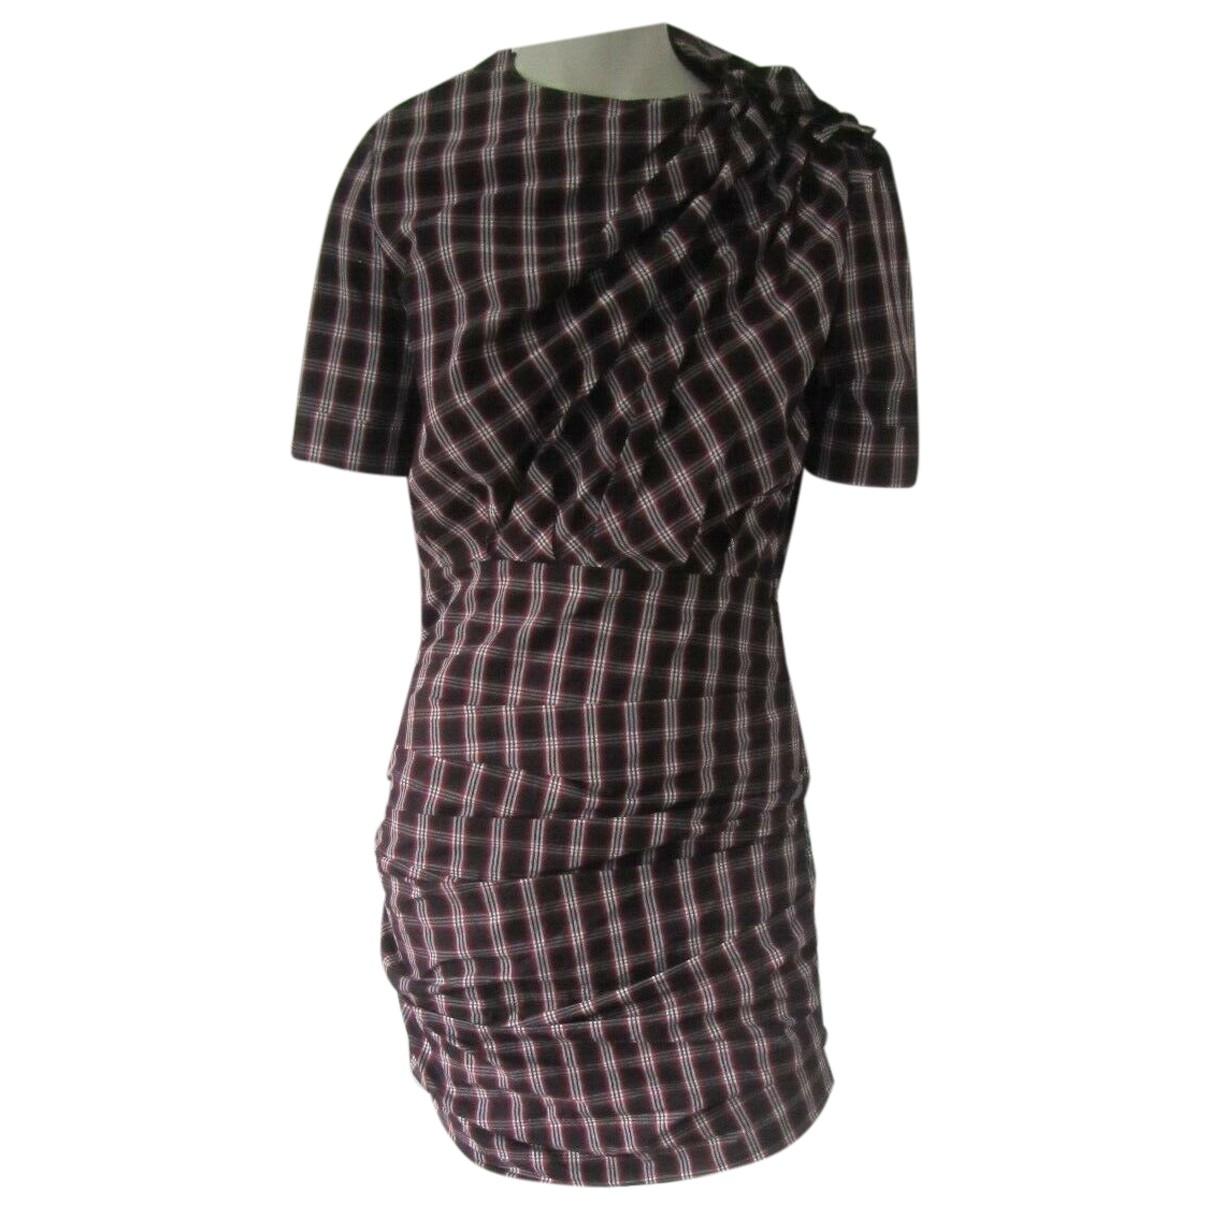 Isabel Marant Etoile \N Multicolour Cotton dress for Women 36 FR